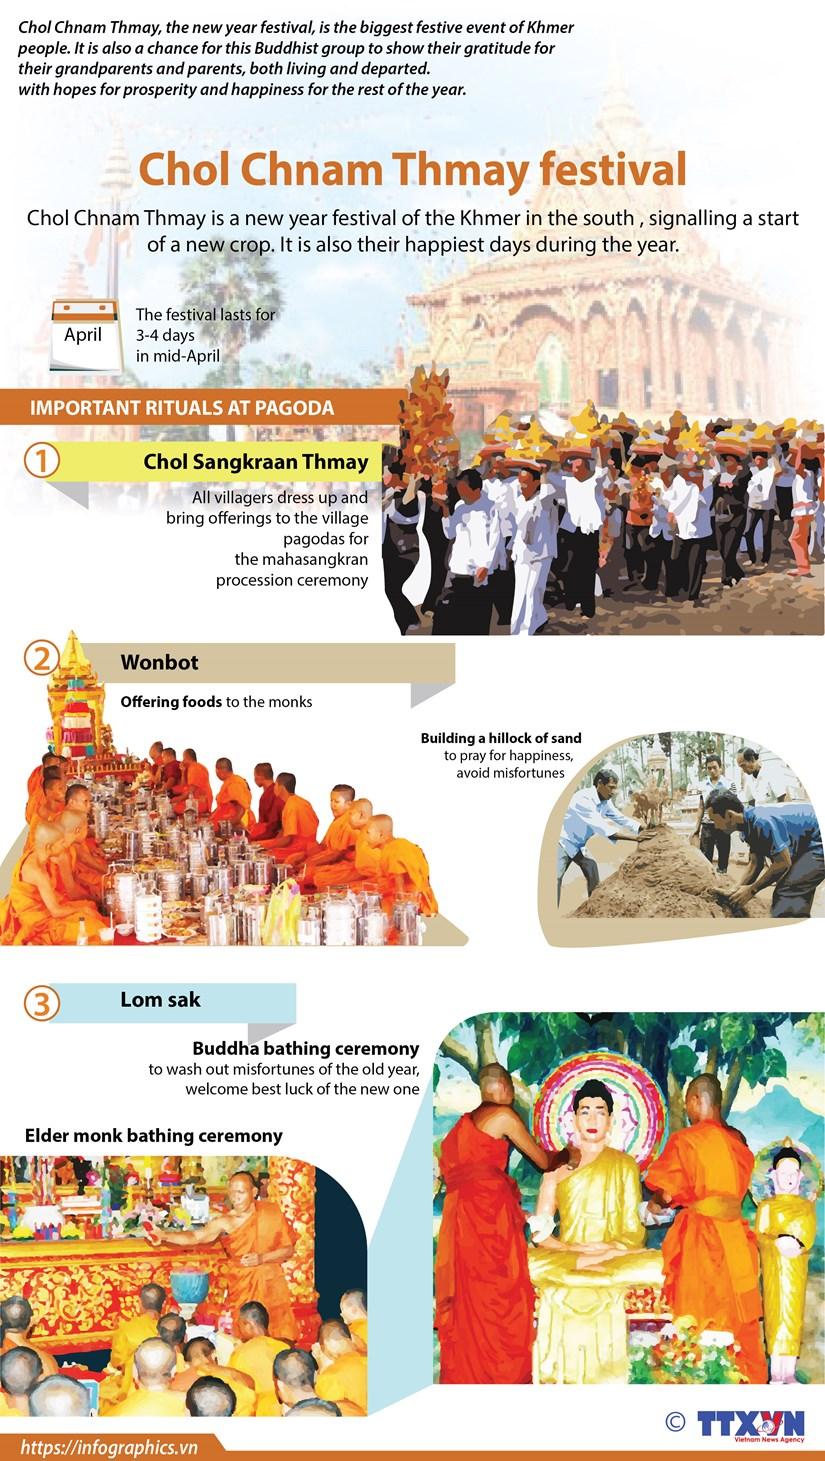 Chol Chnam Thmay festival hinh anh 1